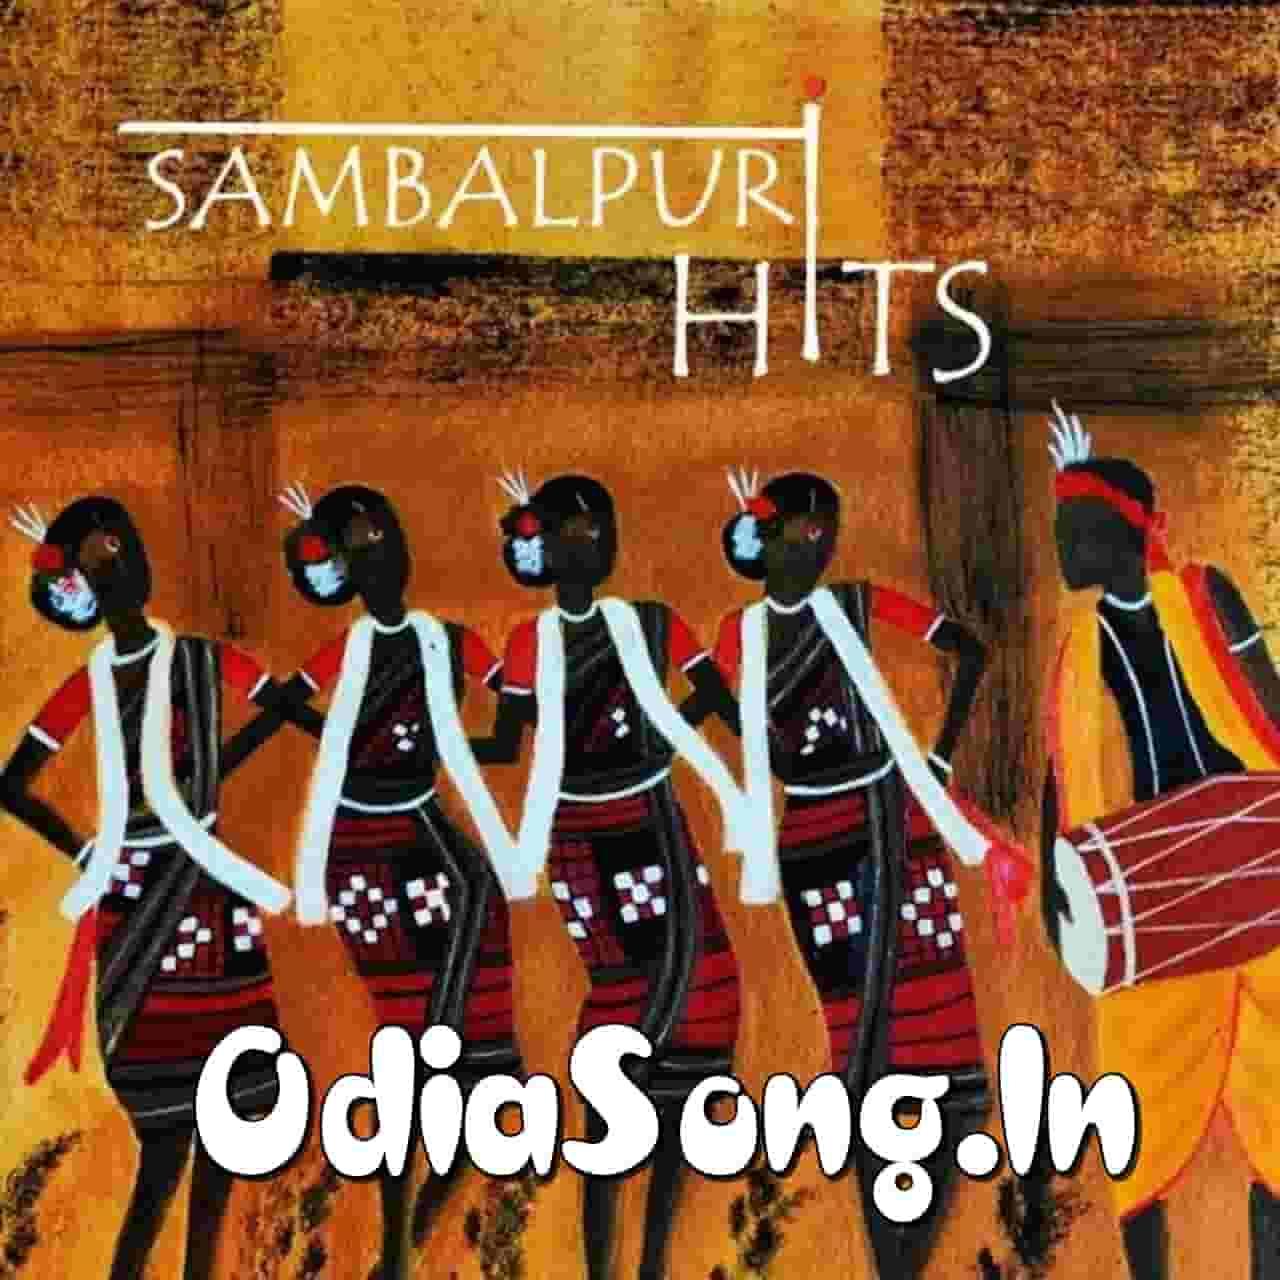 I Love You Kahideli Heijaesi Love - Sambalpuri By Rohit Deep